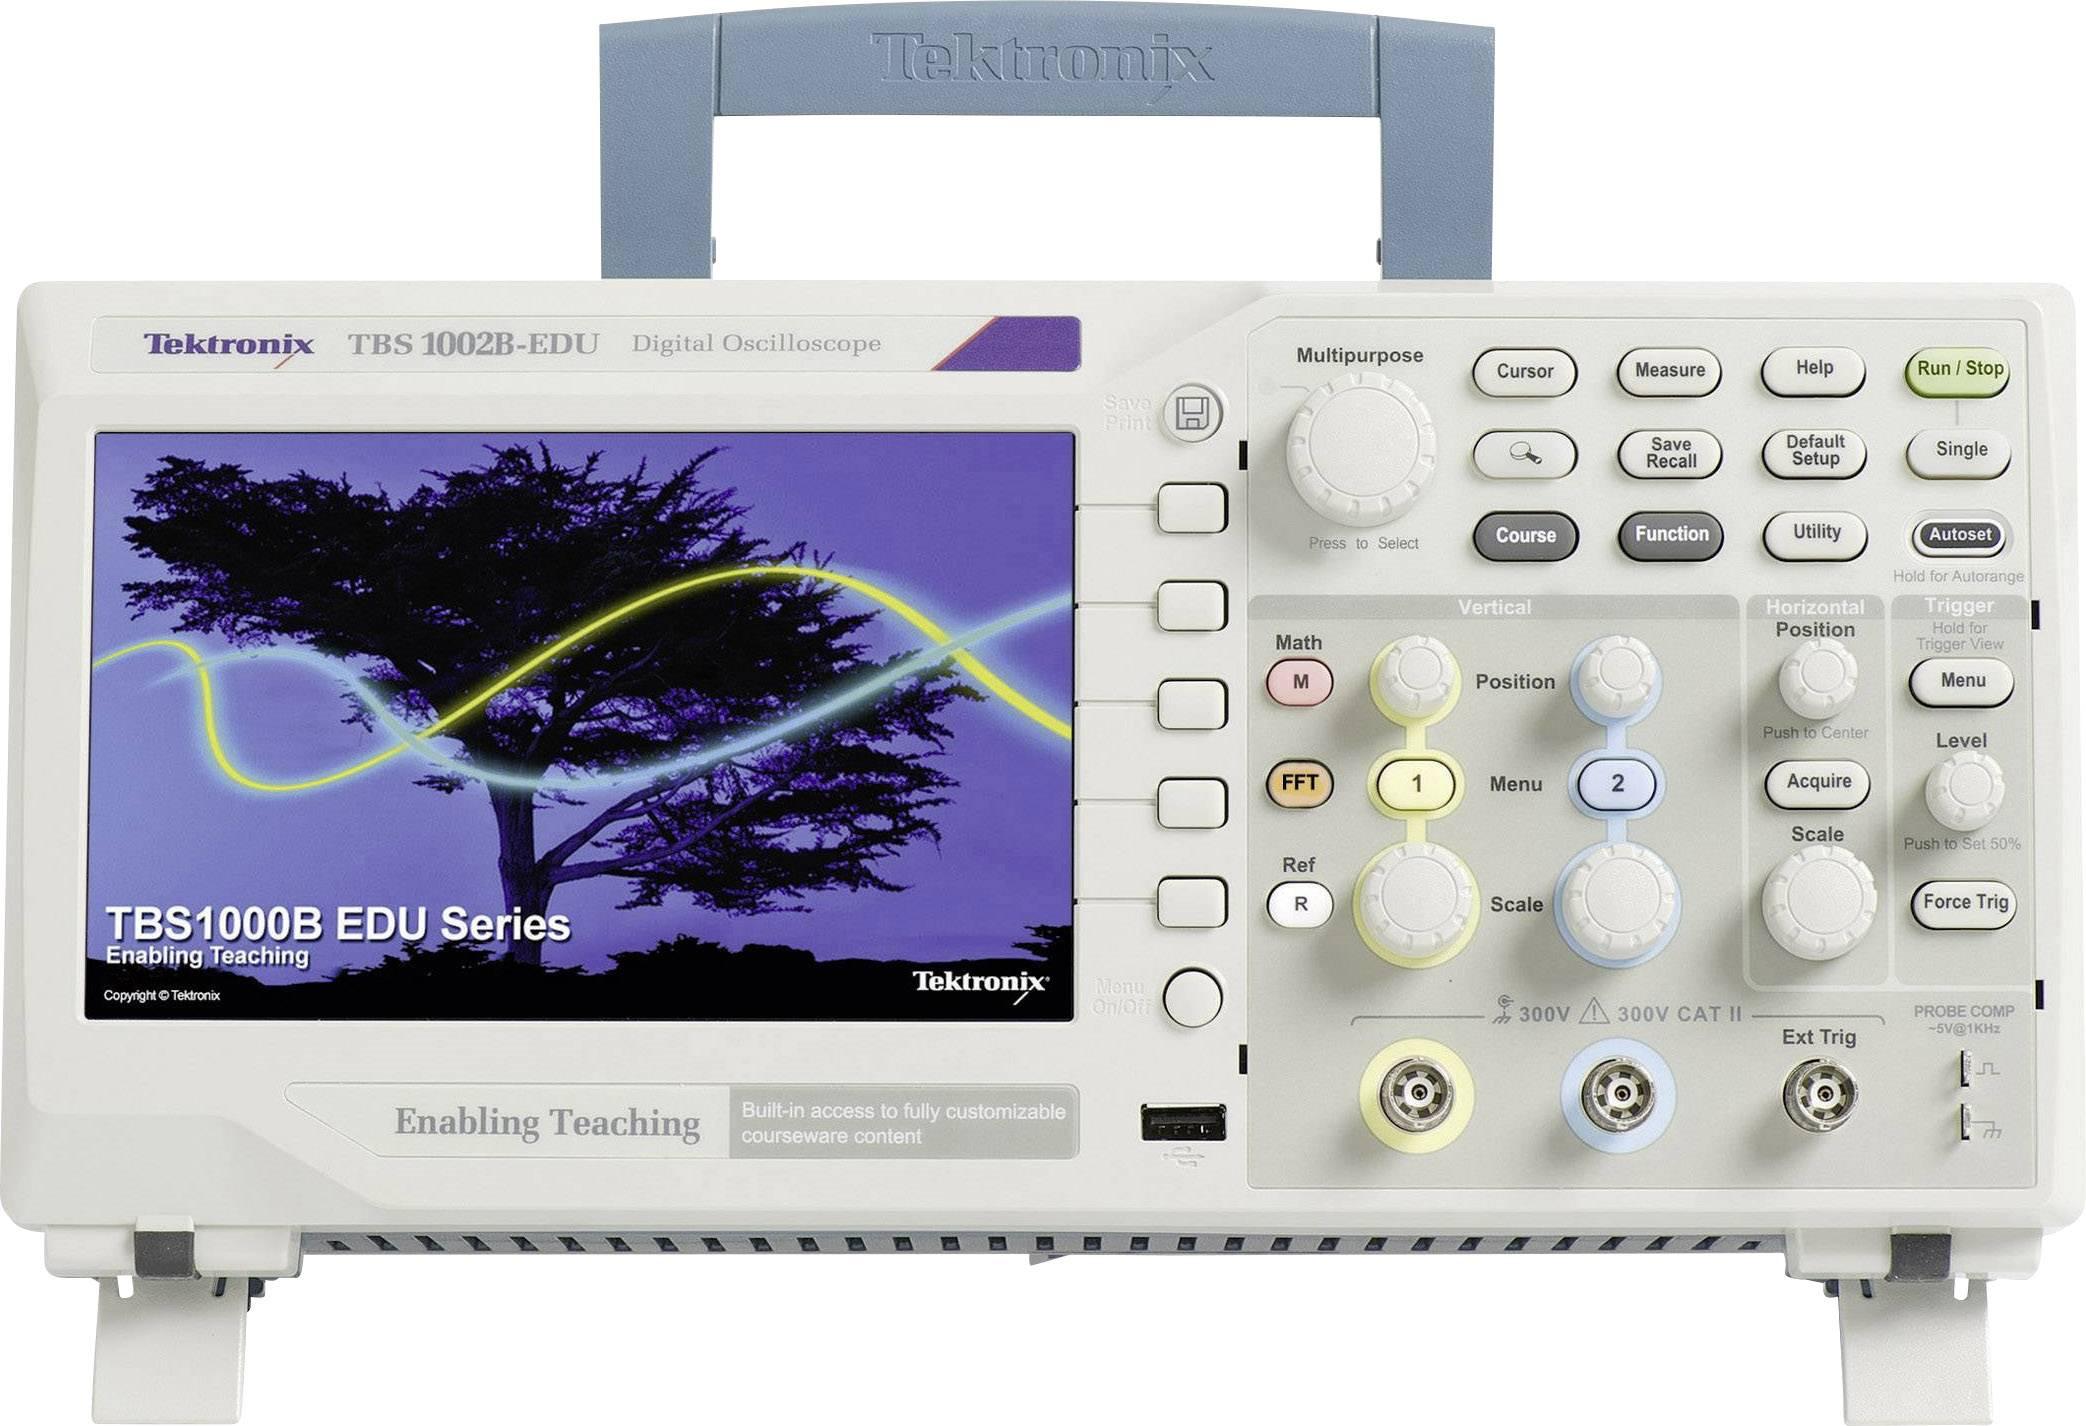 Digitální osciloskop Tektronix TBS1072B-EDU, 70 MHz, 2kanálový, kalibrováno dle ISO